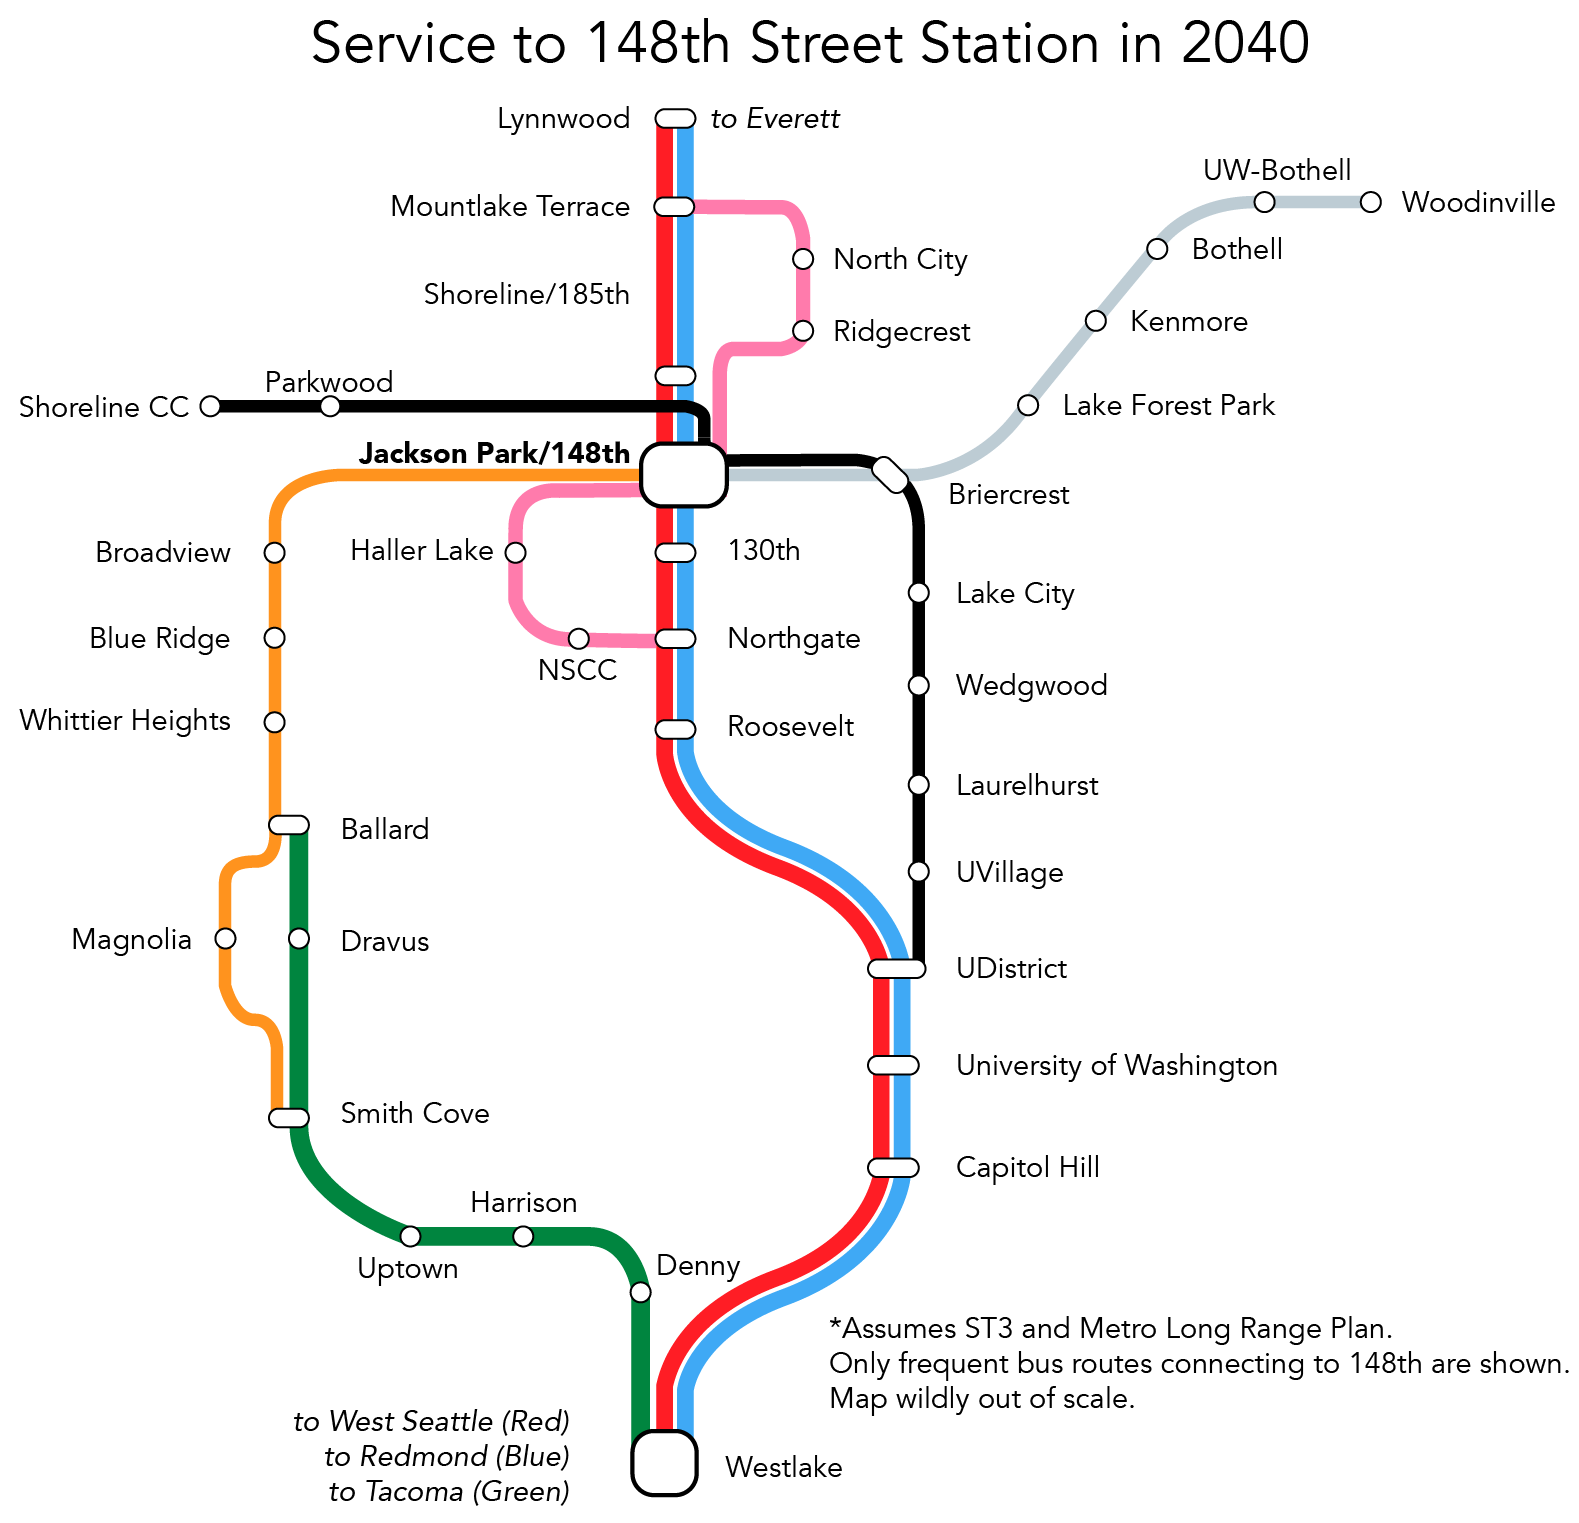 Shoreline 145th Street Service in 2040-01-01